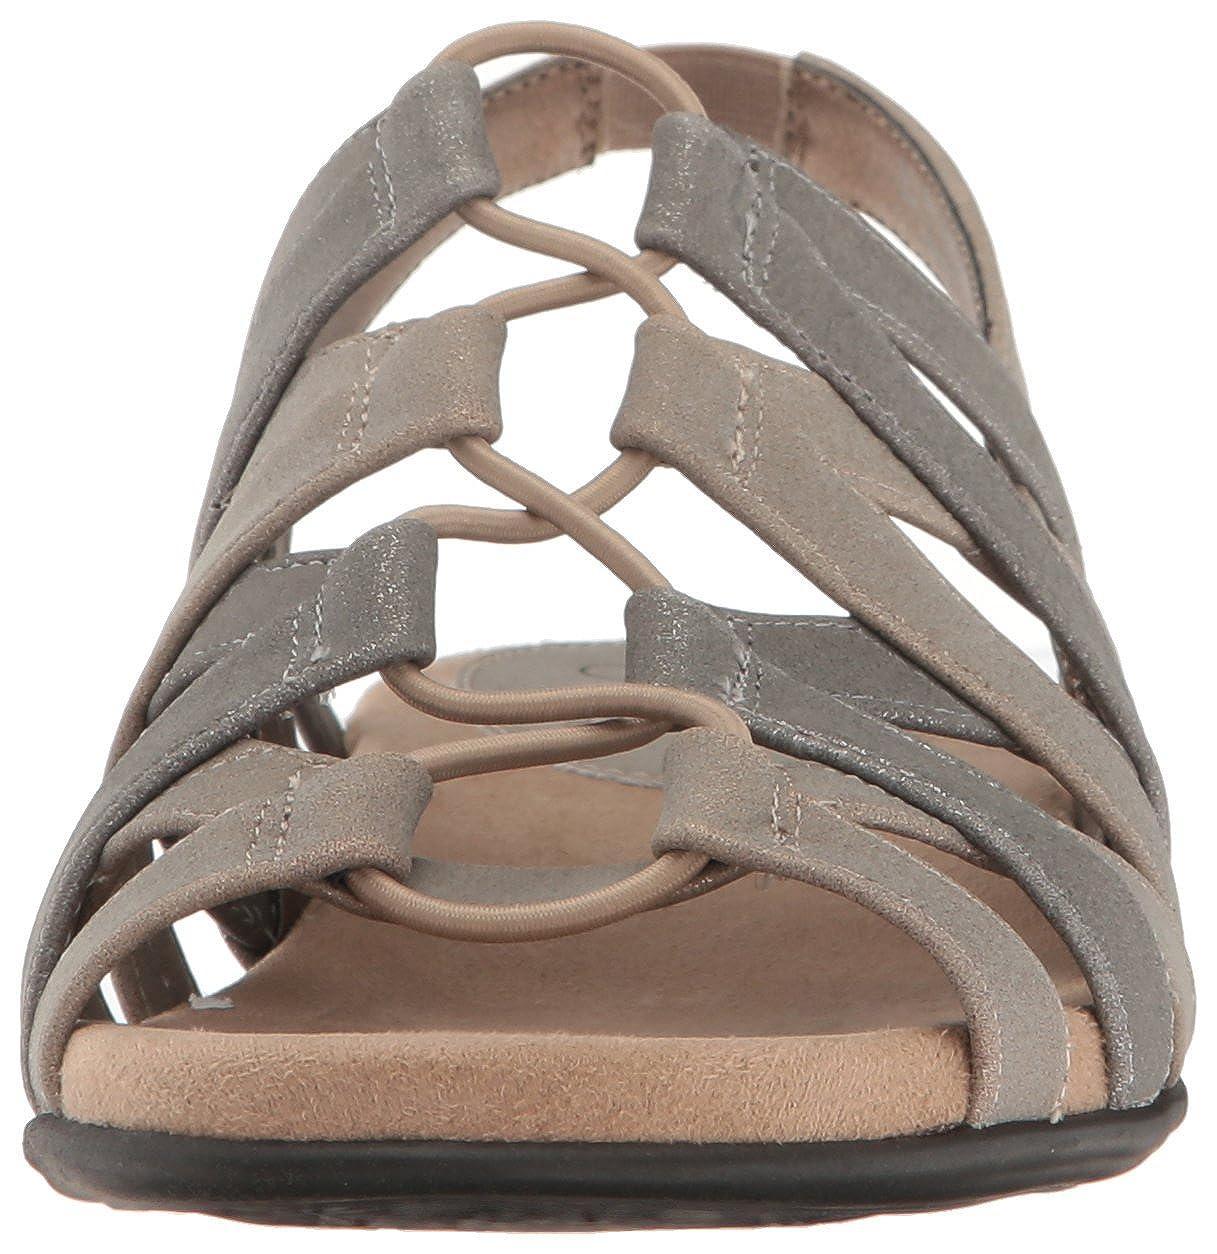 LifeStride Womens Behave Gladiator Sandal